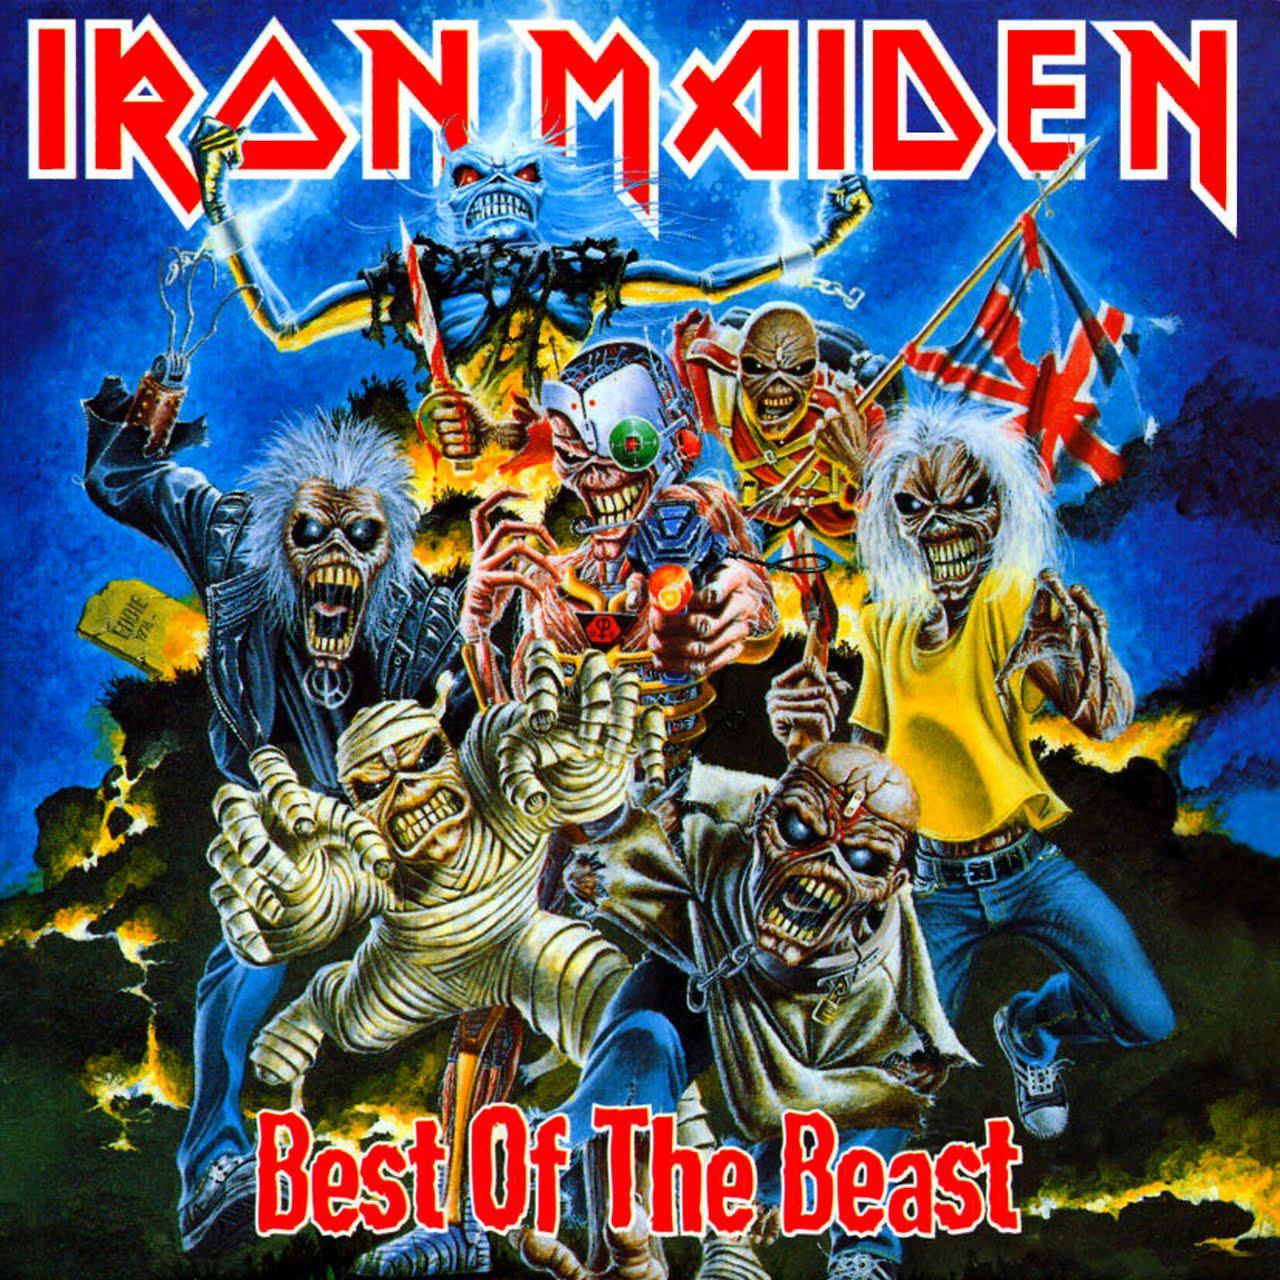 Iron Maiden - Best Of The Beast (2CD, 1996)